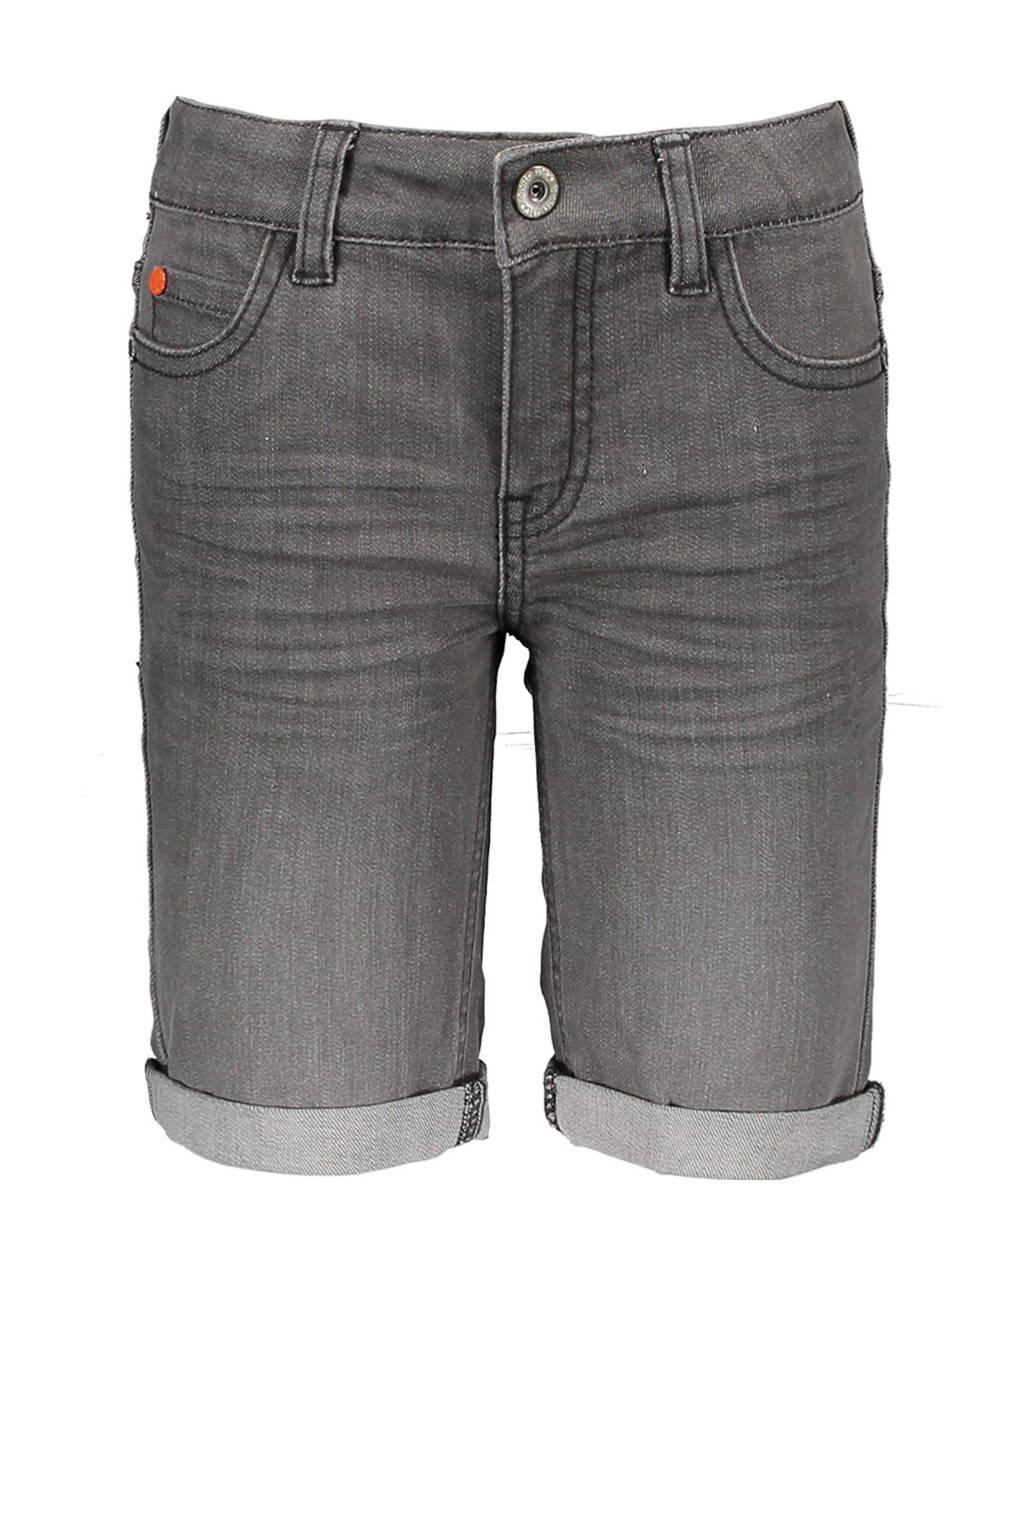 TYGO & vito slim fit jeans bermuda grijs stonewashed, Grijs stonewashed